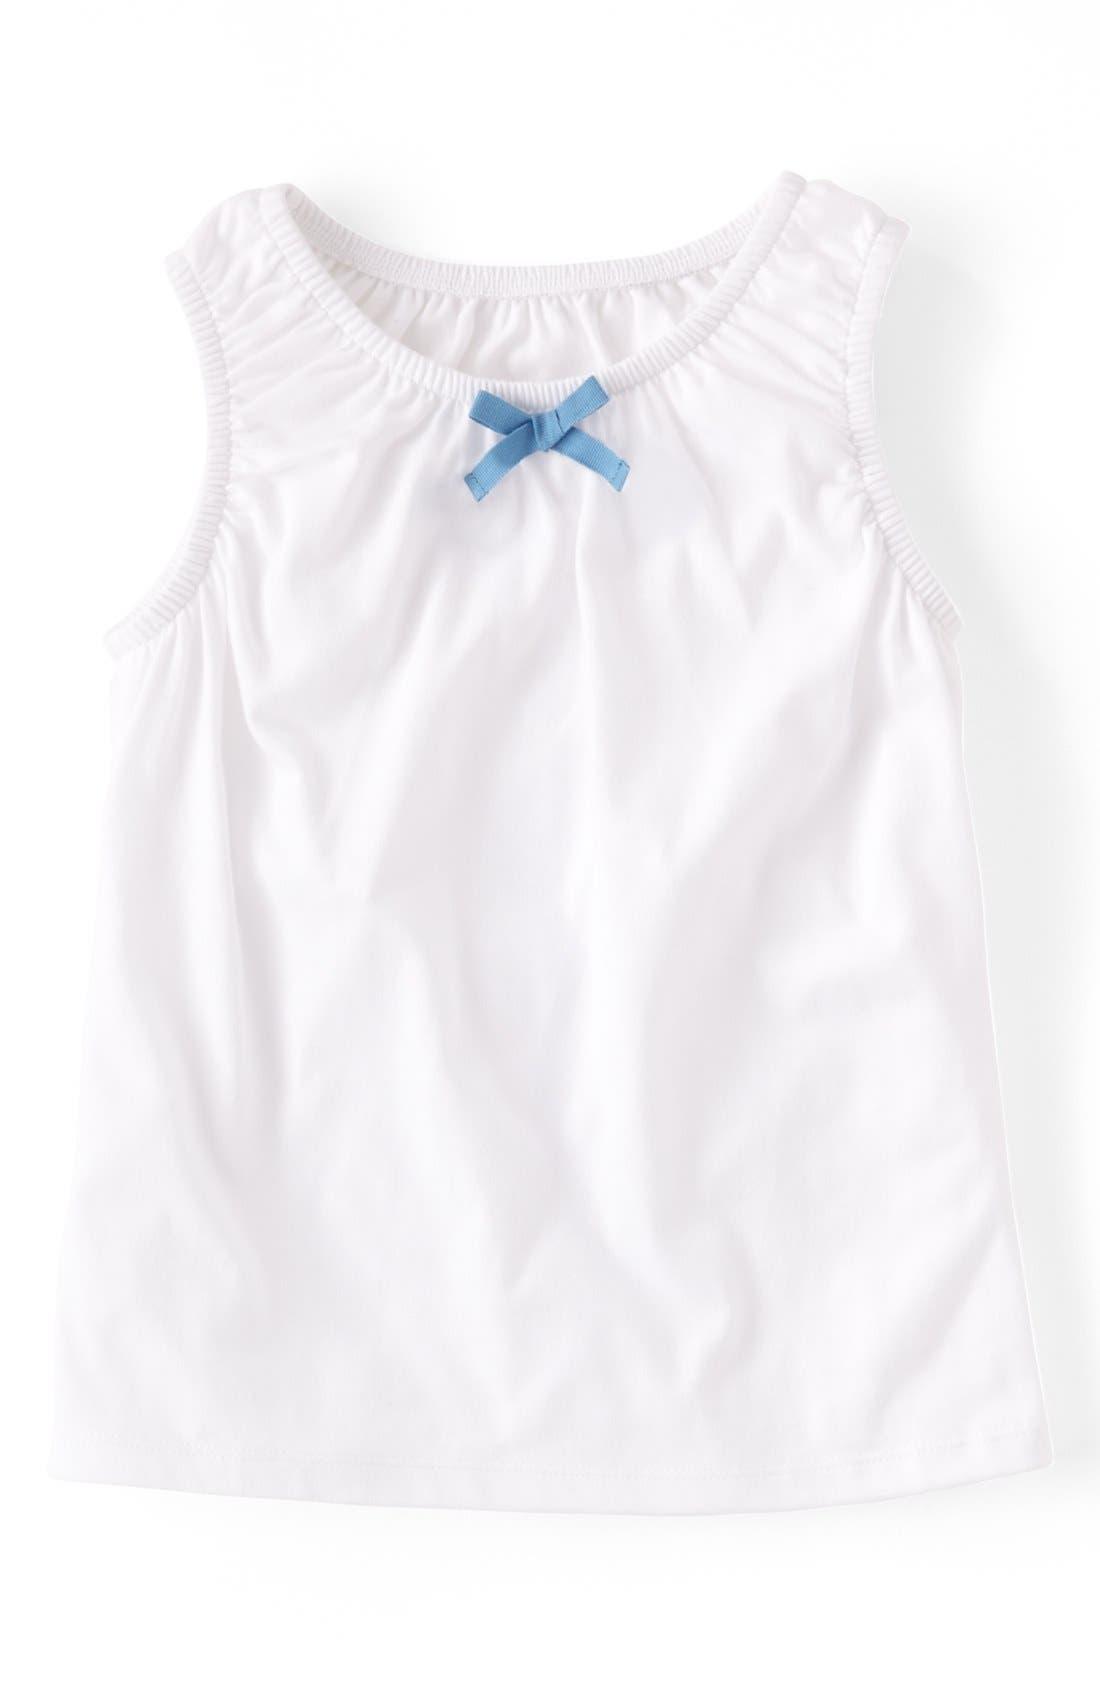 Main Image - Mini Boden 'Pretty' Tank Top (Toddler Girls, Little Girls & Big Girls)(Online Only)